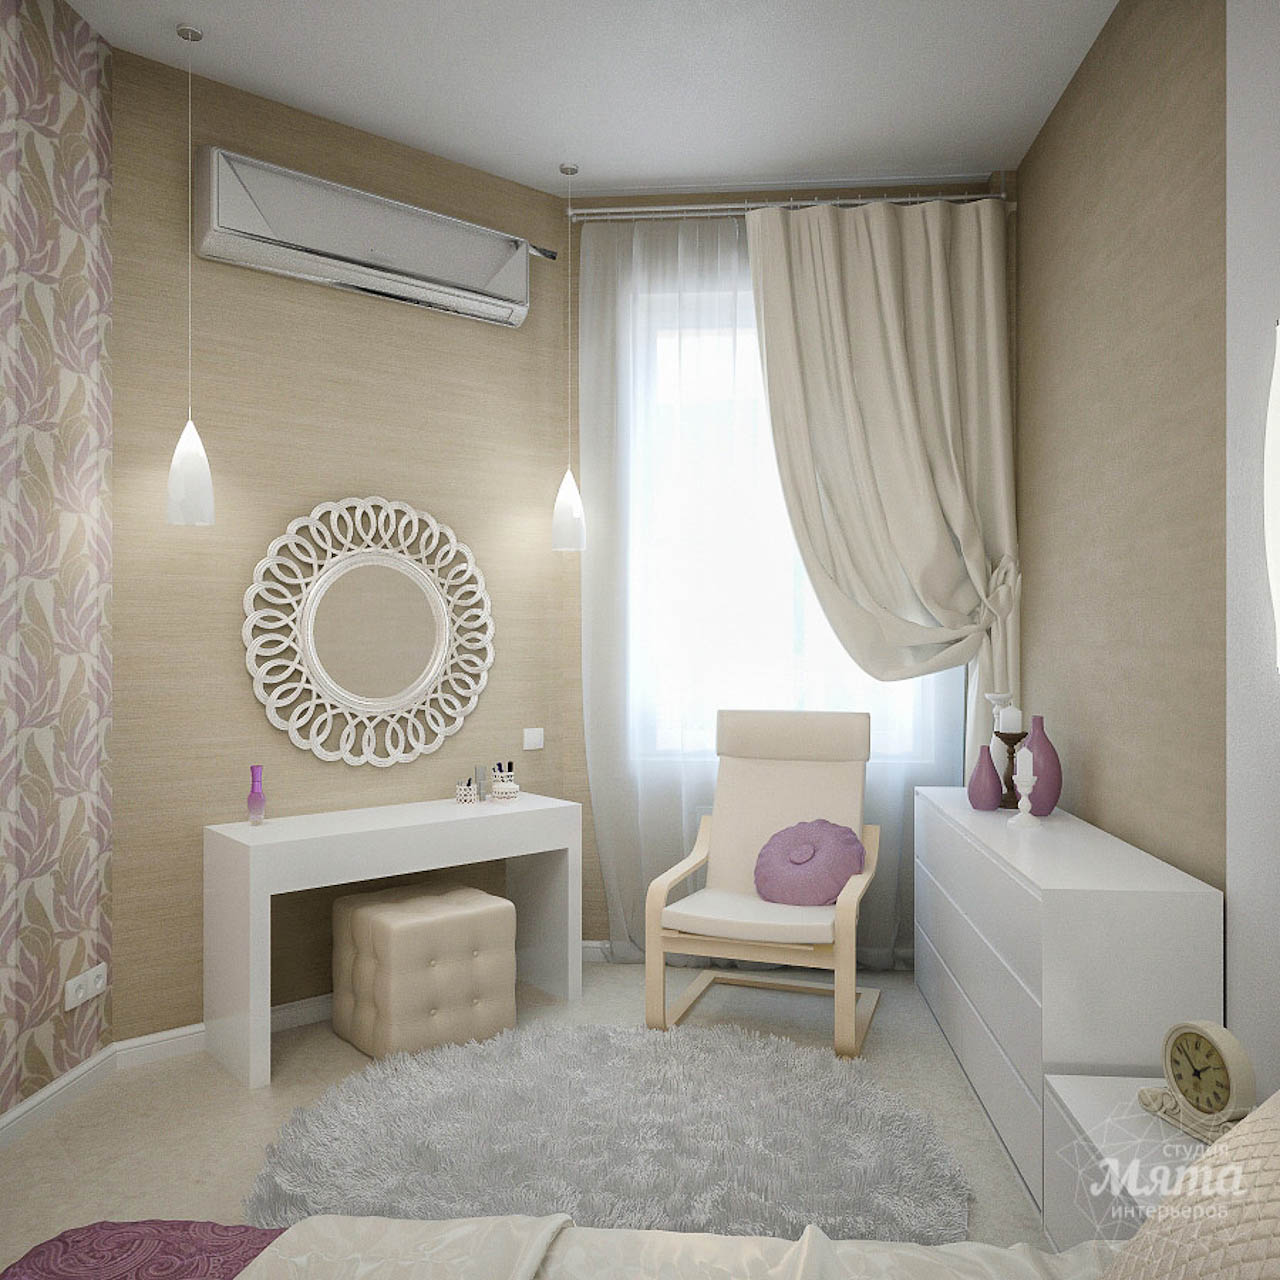 Дизайн интерьера и ремонт трехкомнатной квартиры по ул. Чкалова 124 img1741592729